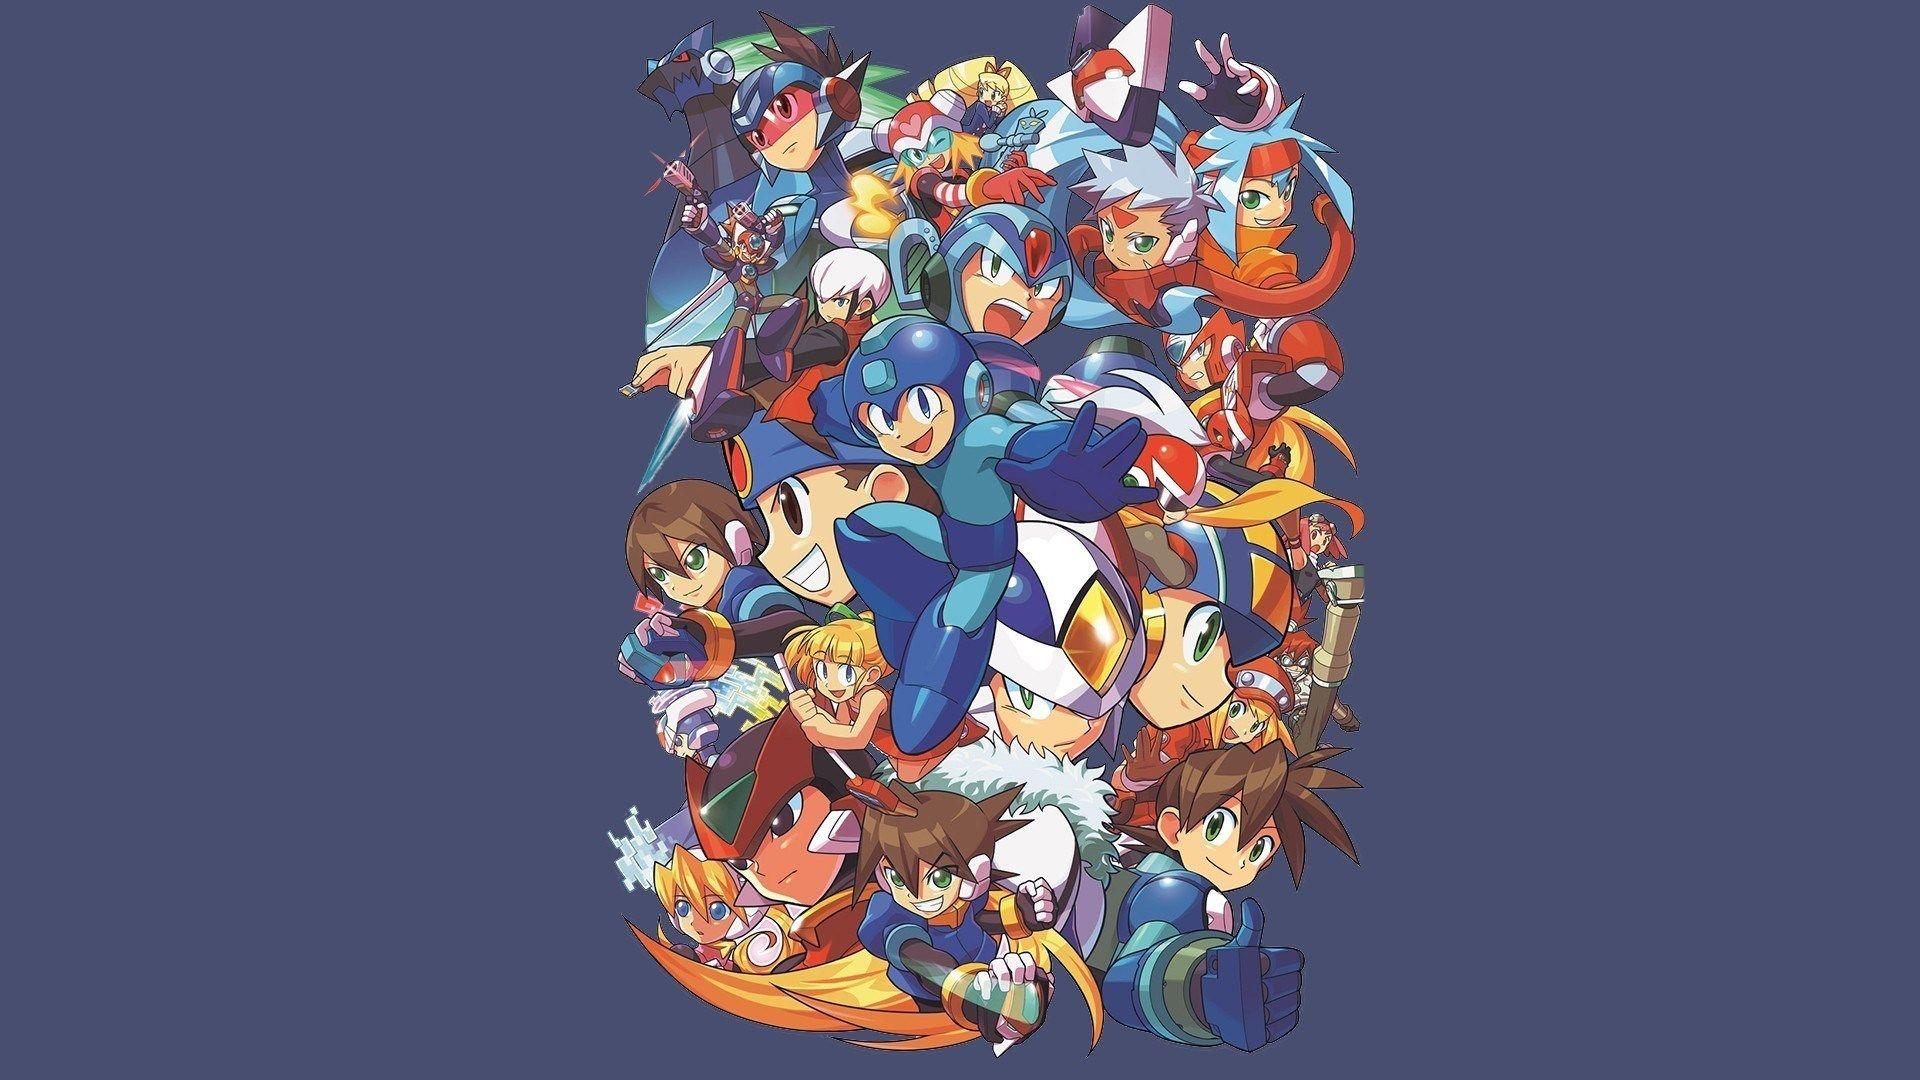 Mega Man 1920x1080 Wallpaper Mega Man Wallpaper Multimedia Artist